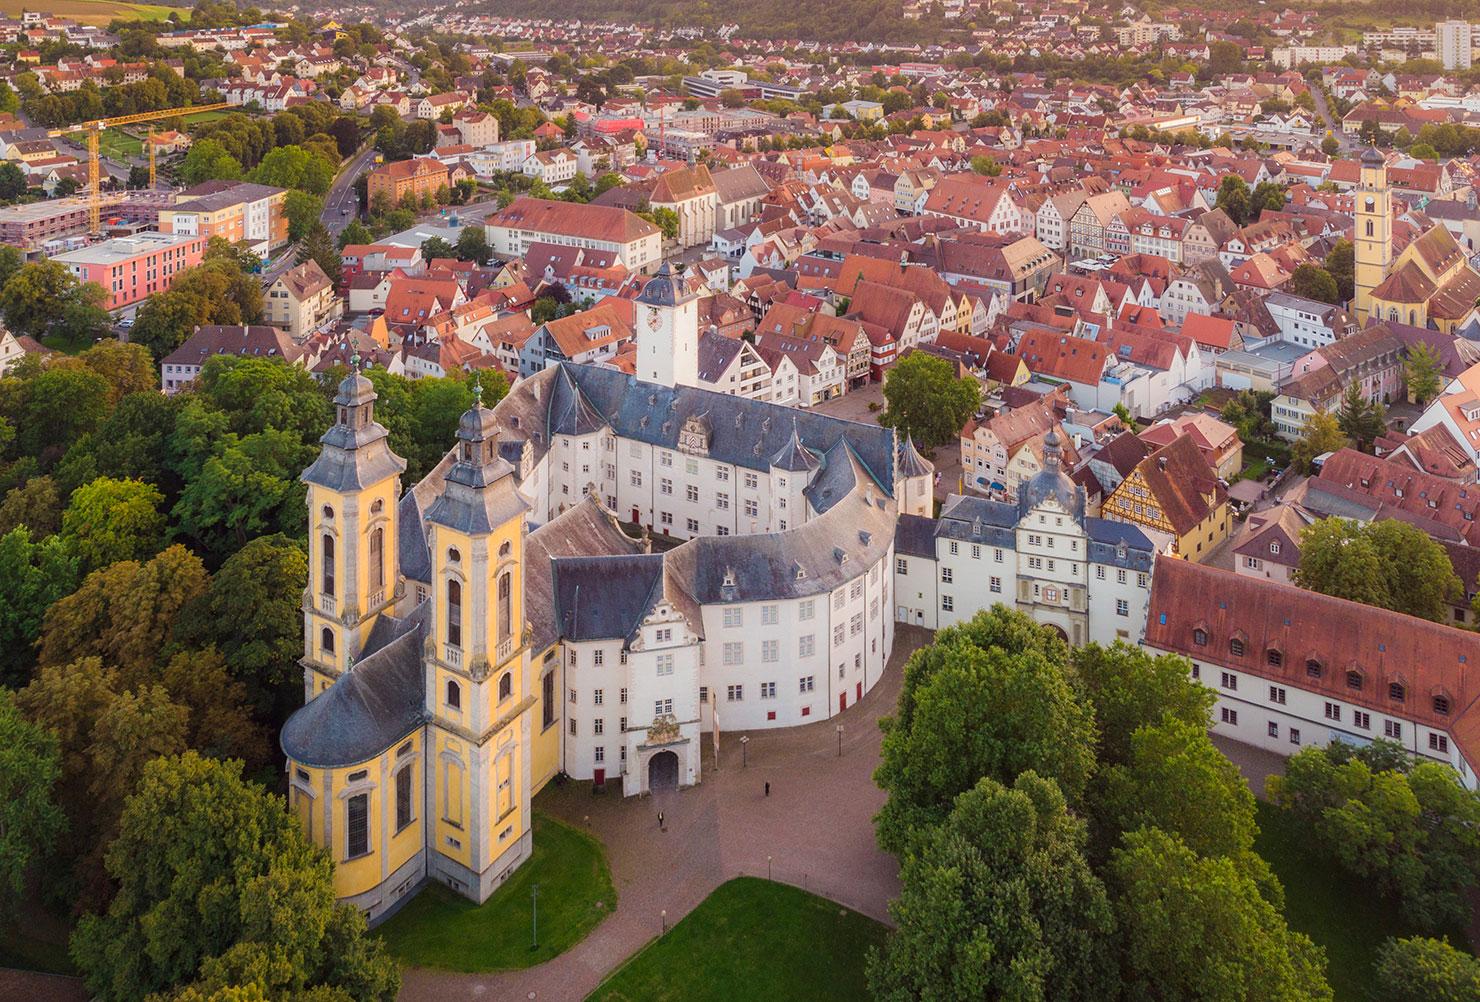 Bad Mergentheim Deutschordenschloss Schlossgarten